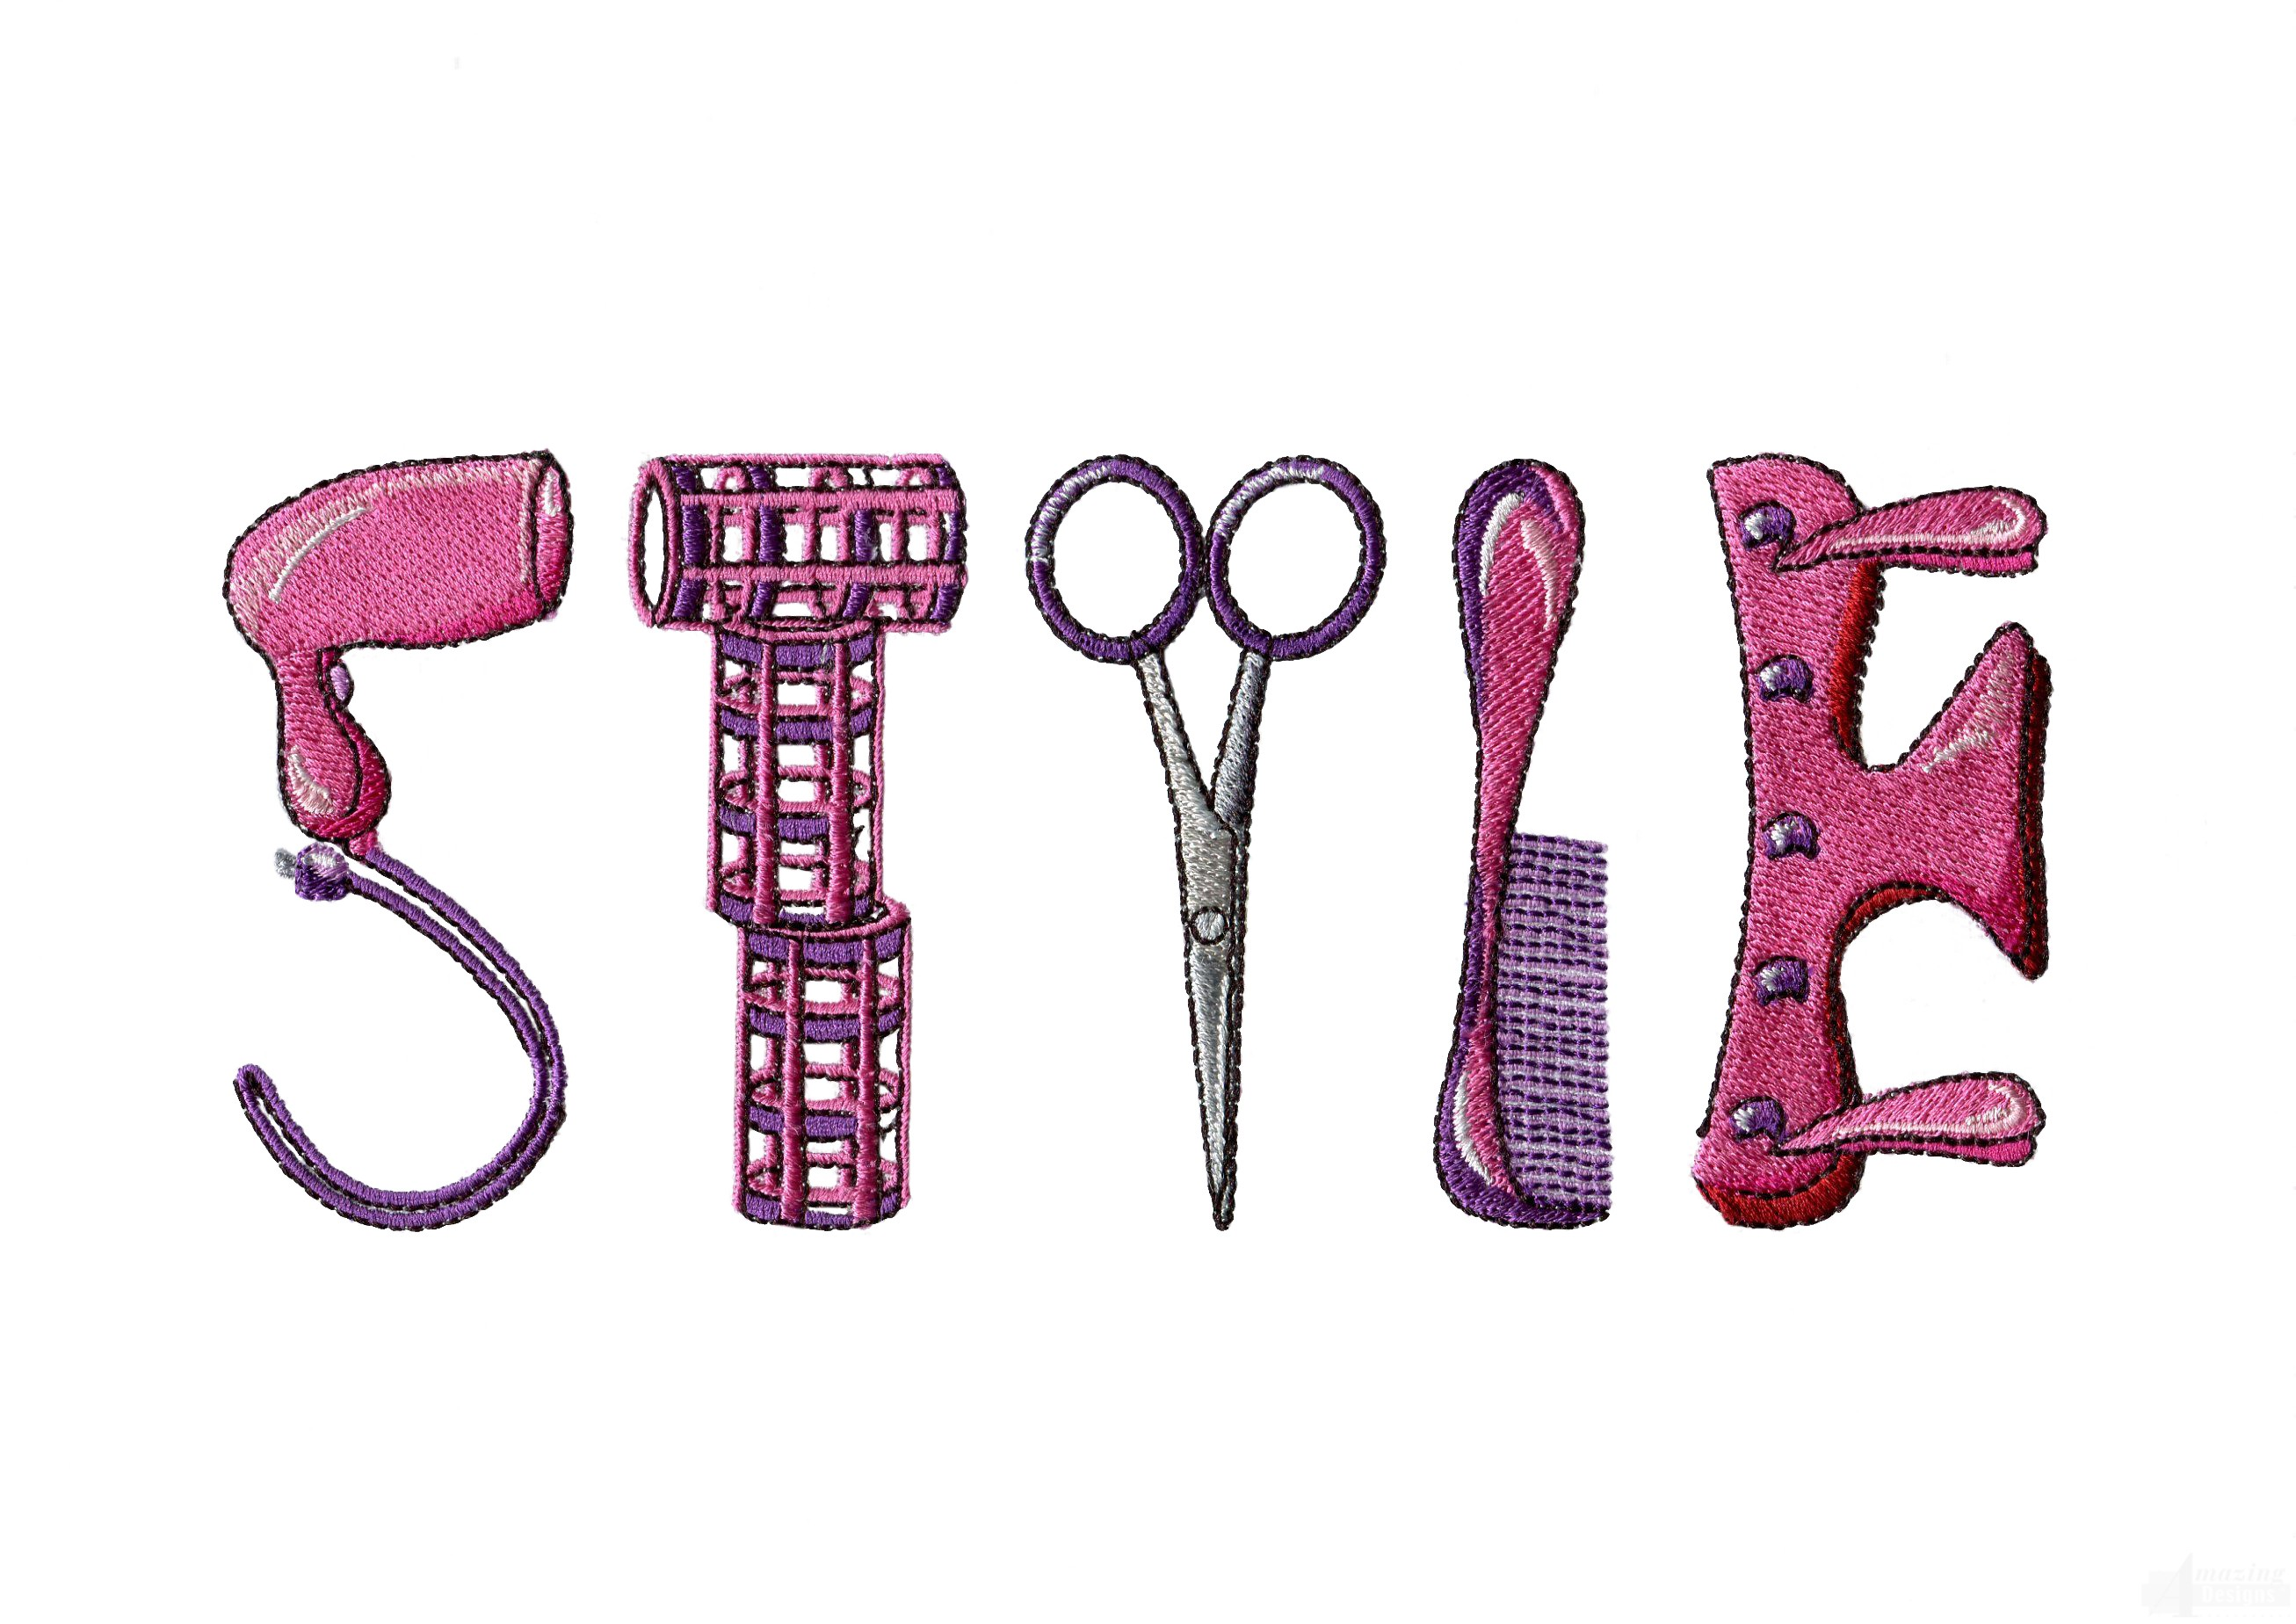 Services & Pricing - European style Hair salon providing a ...  |Beauty Salon Wallpaper Designs